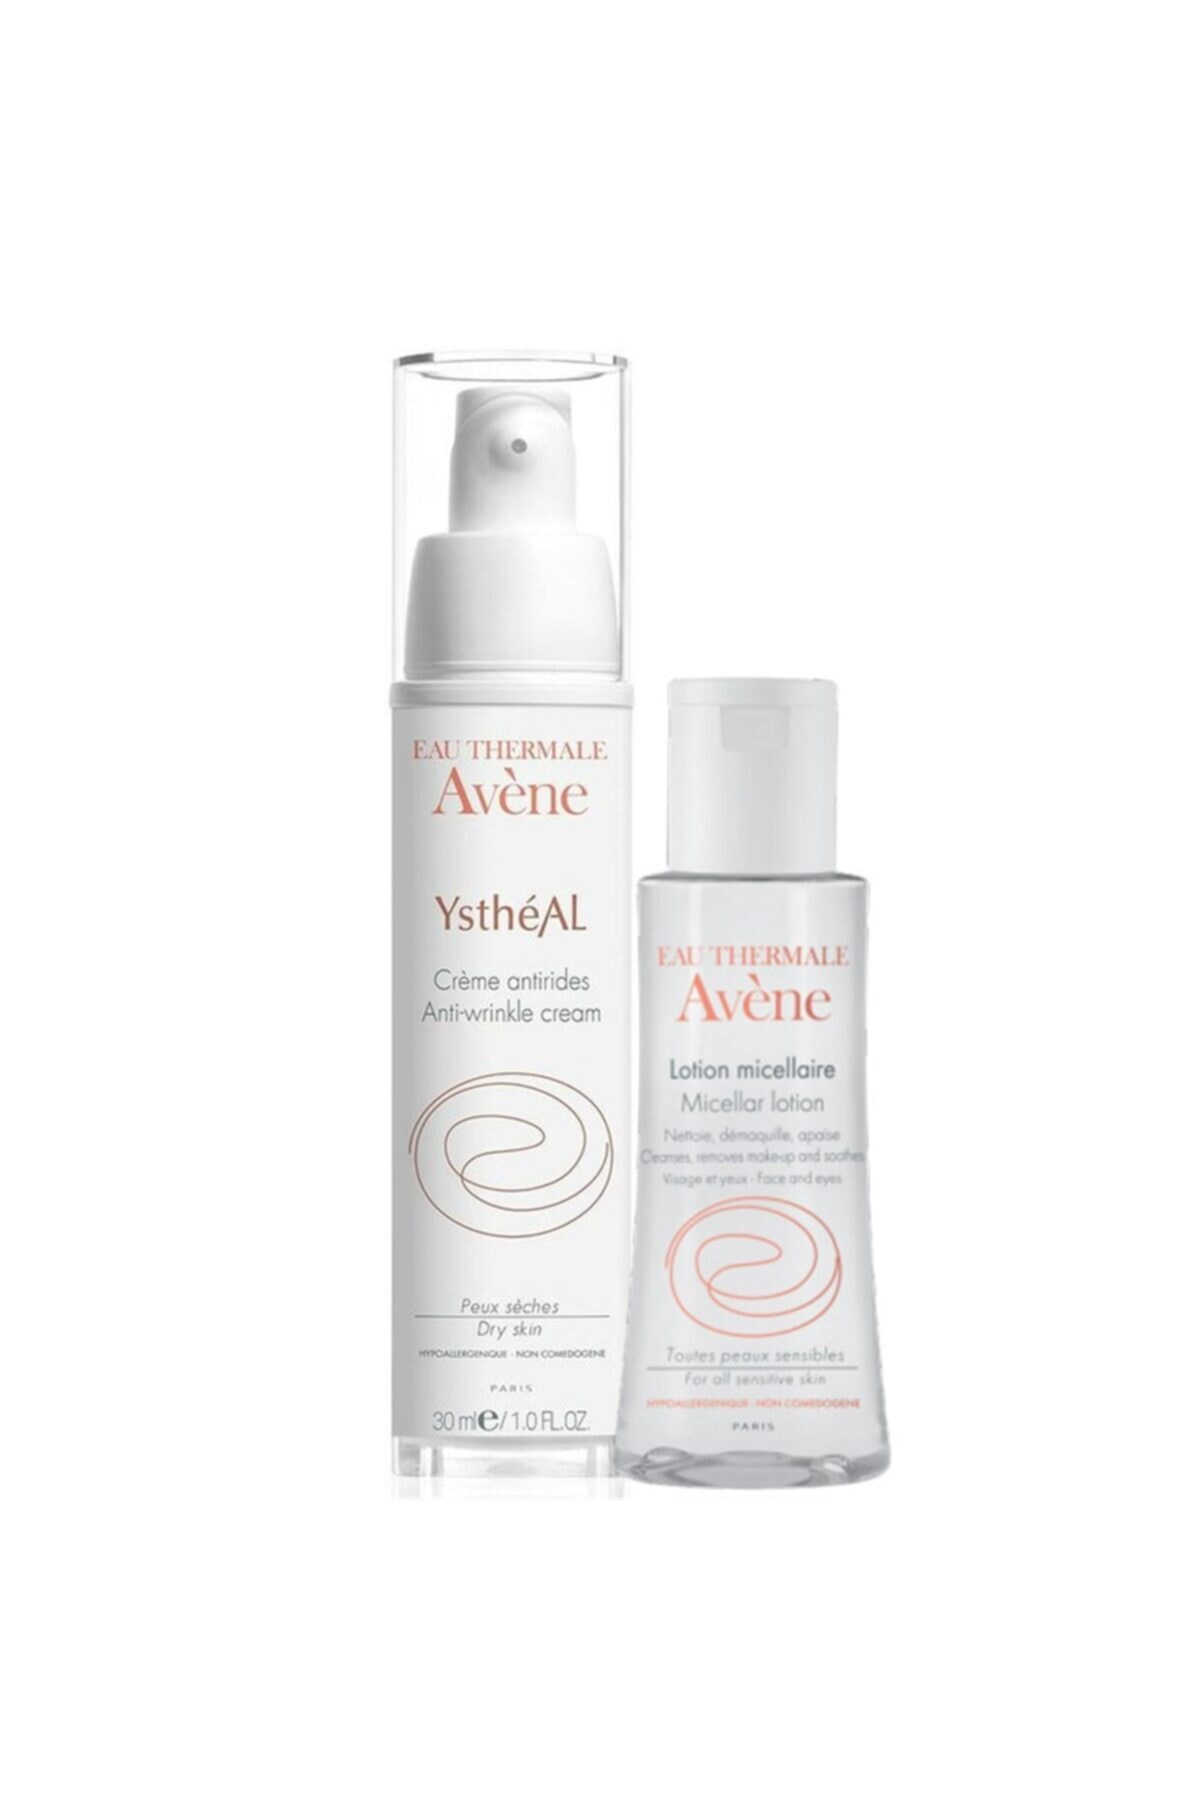 Avene Ystheal Emulsion 30 ml + Lotion Micellaire 100 ml 1